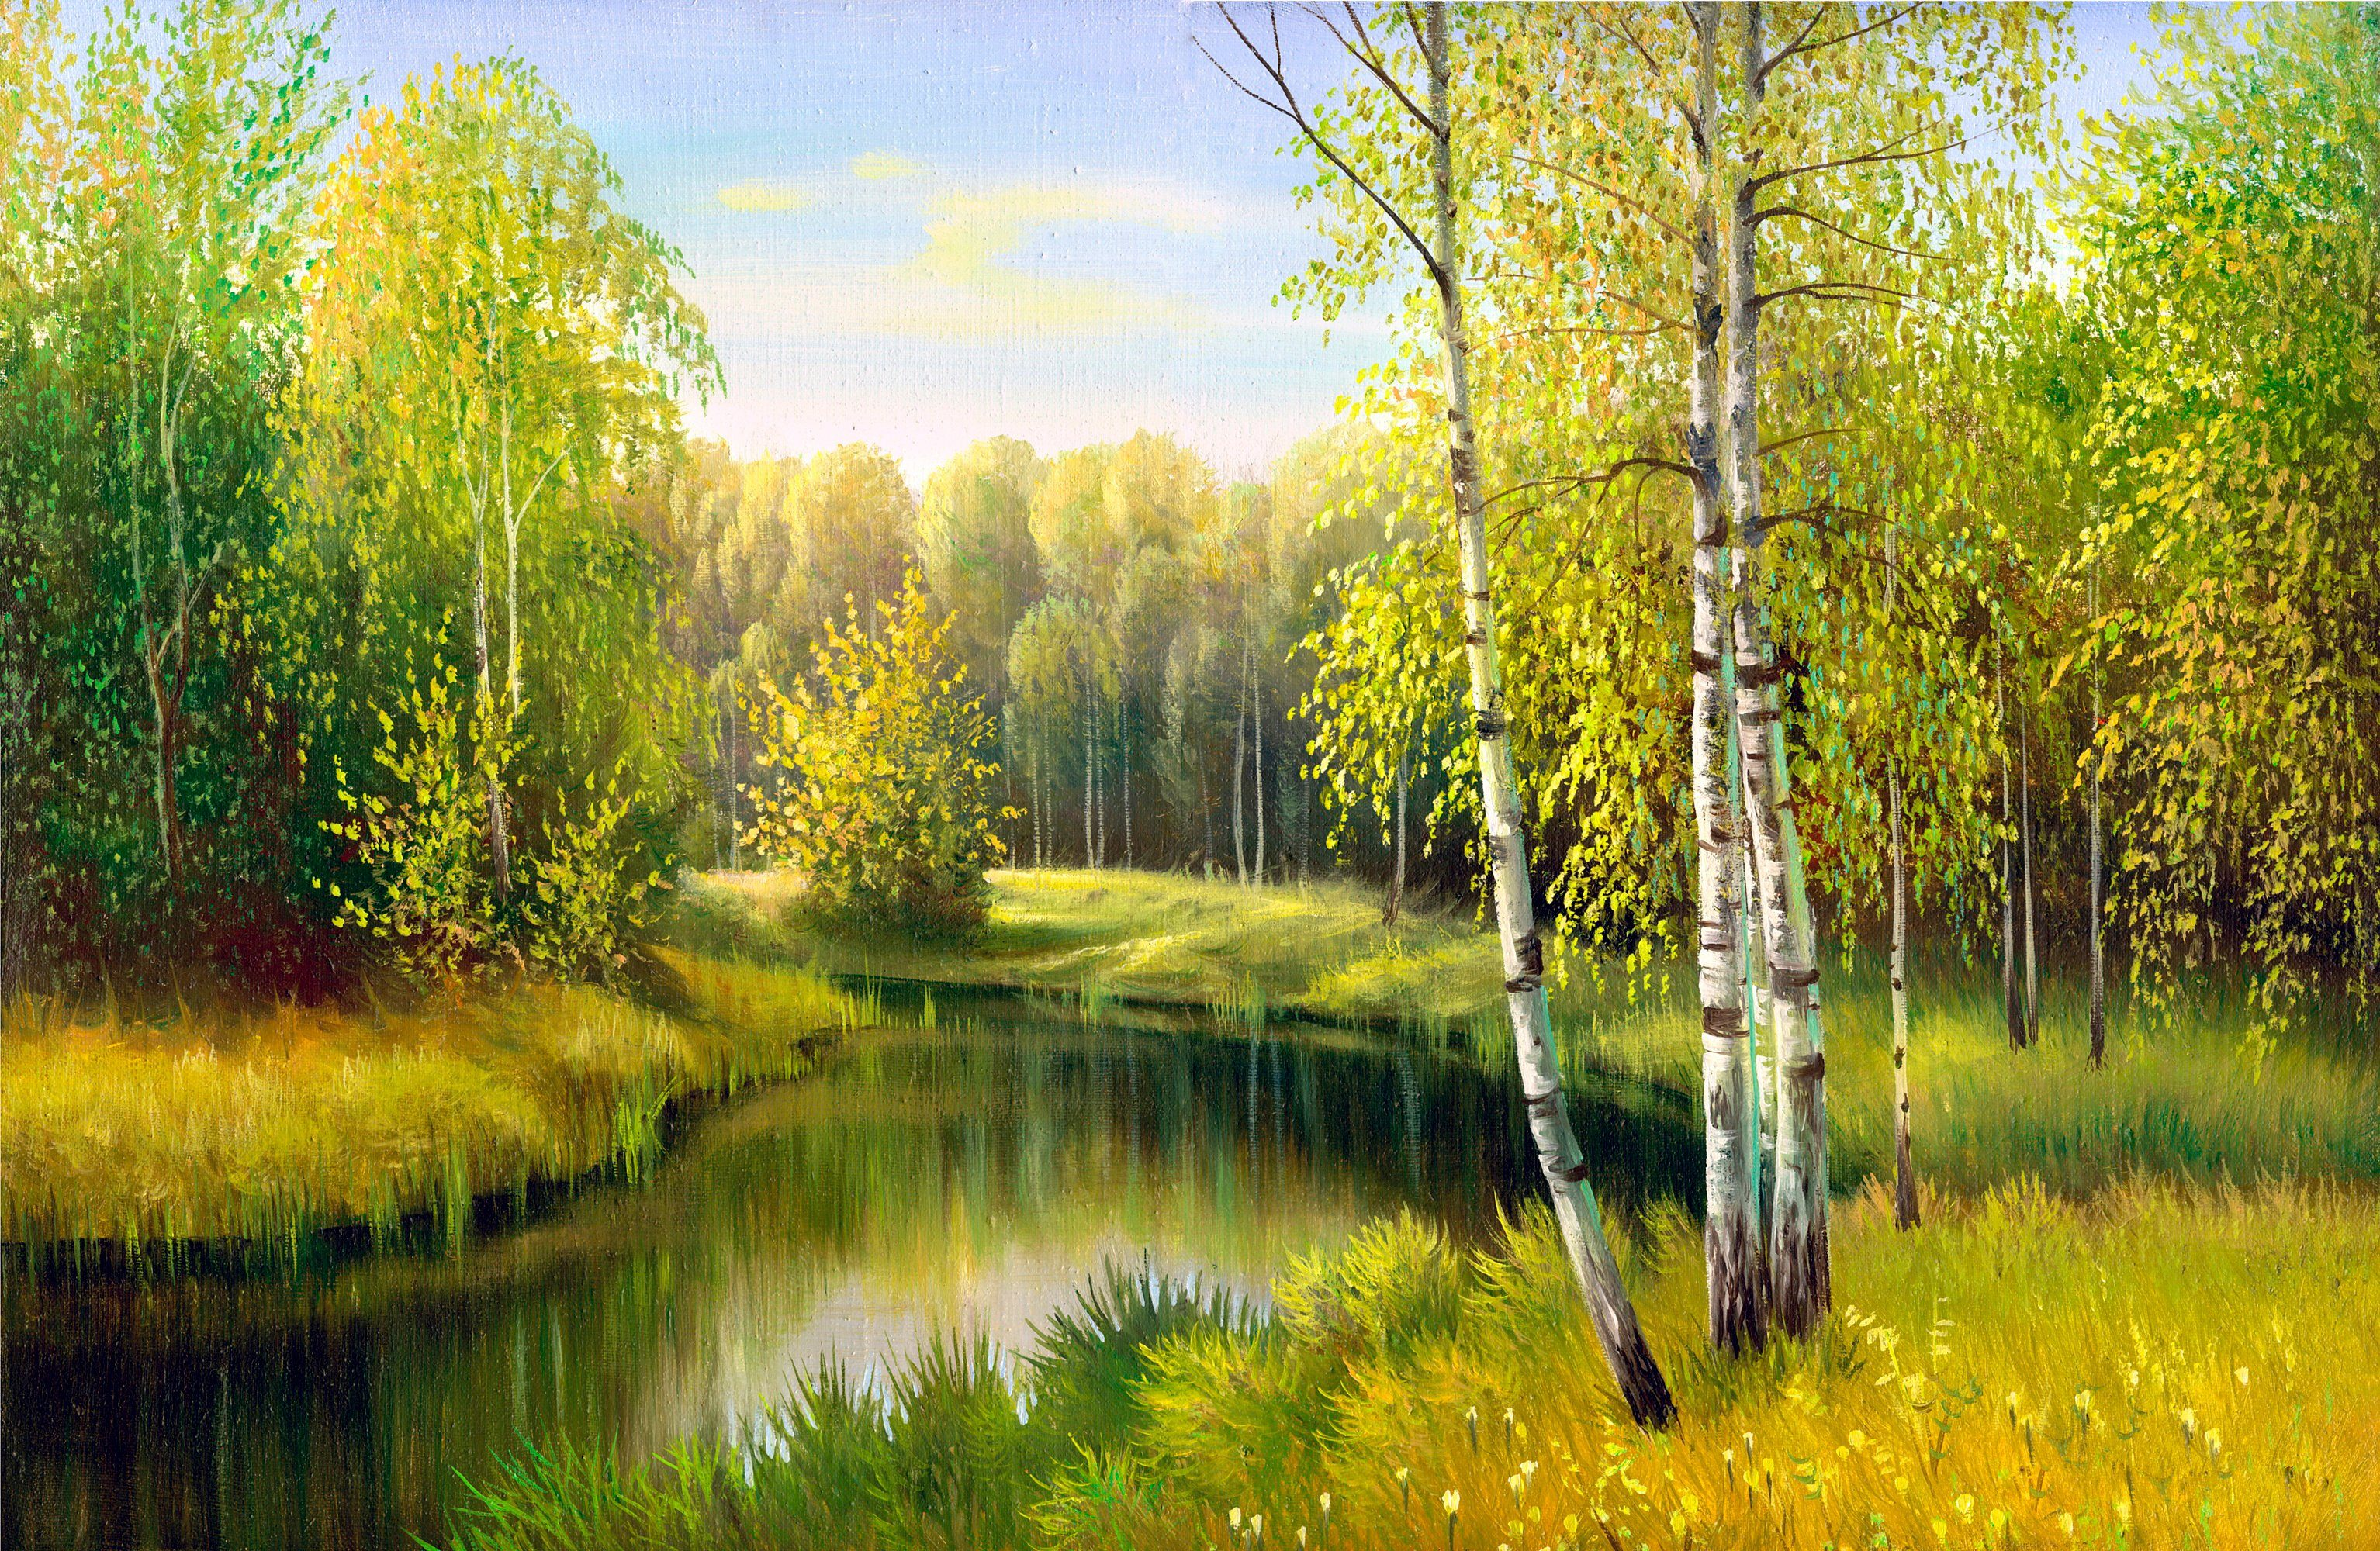 PAPERMOON Fototapete »River in Autumn Day«, BlueBack, 7 Bahnen, 350 x 260 cm